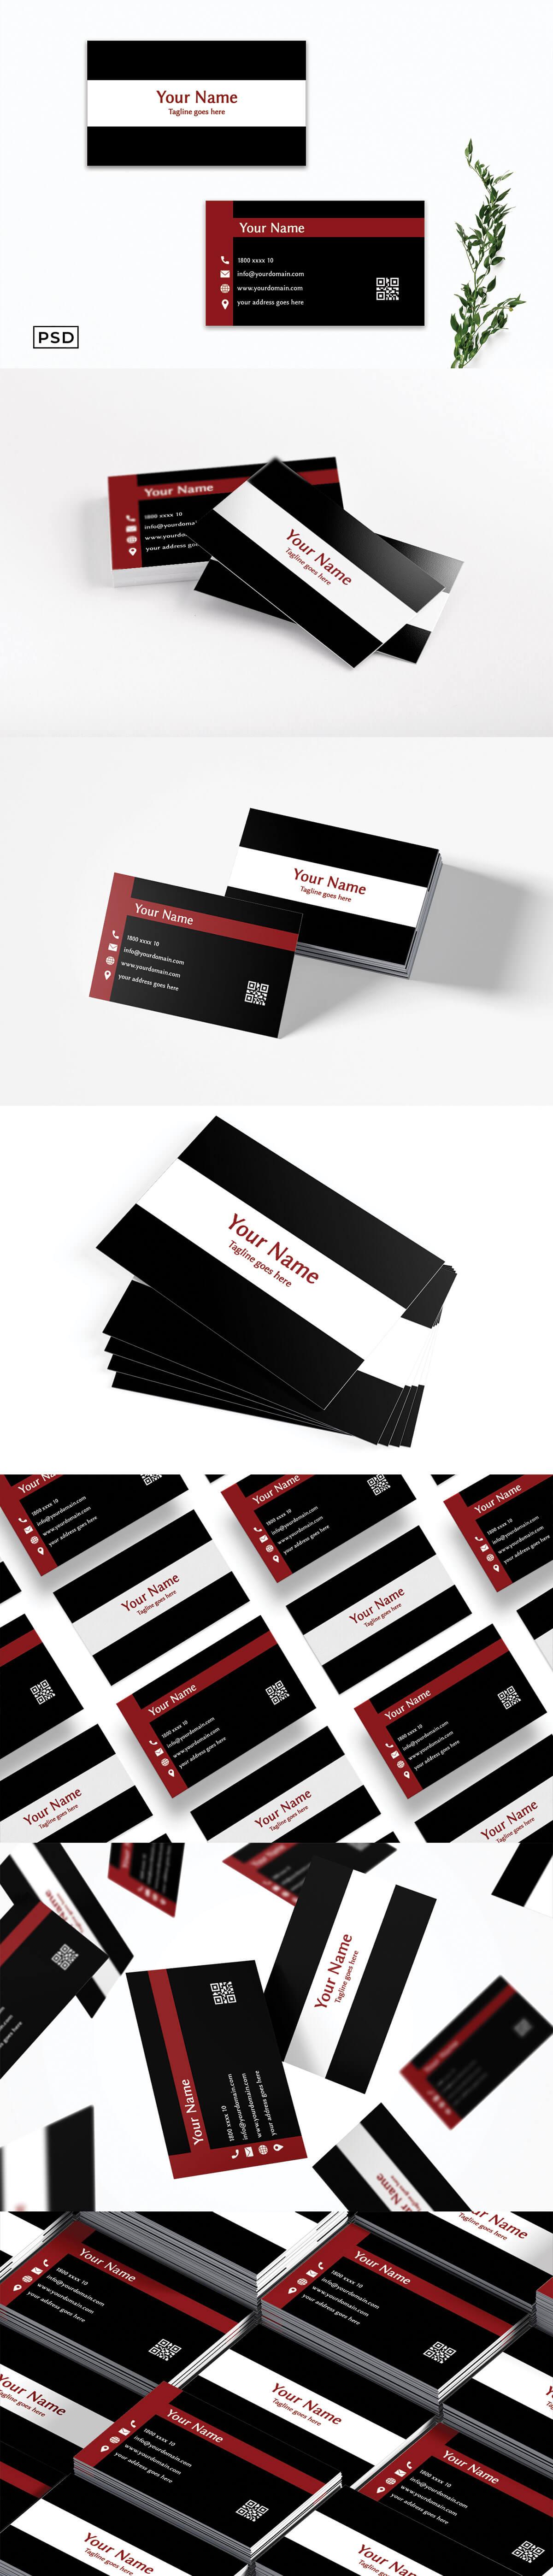 Free Modern Black Minimalist Business Card Template